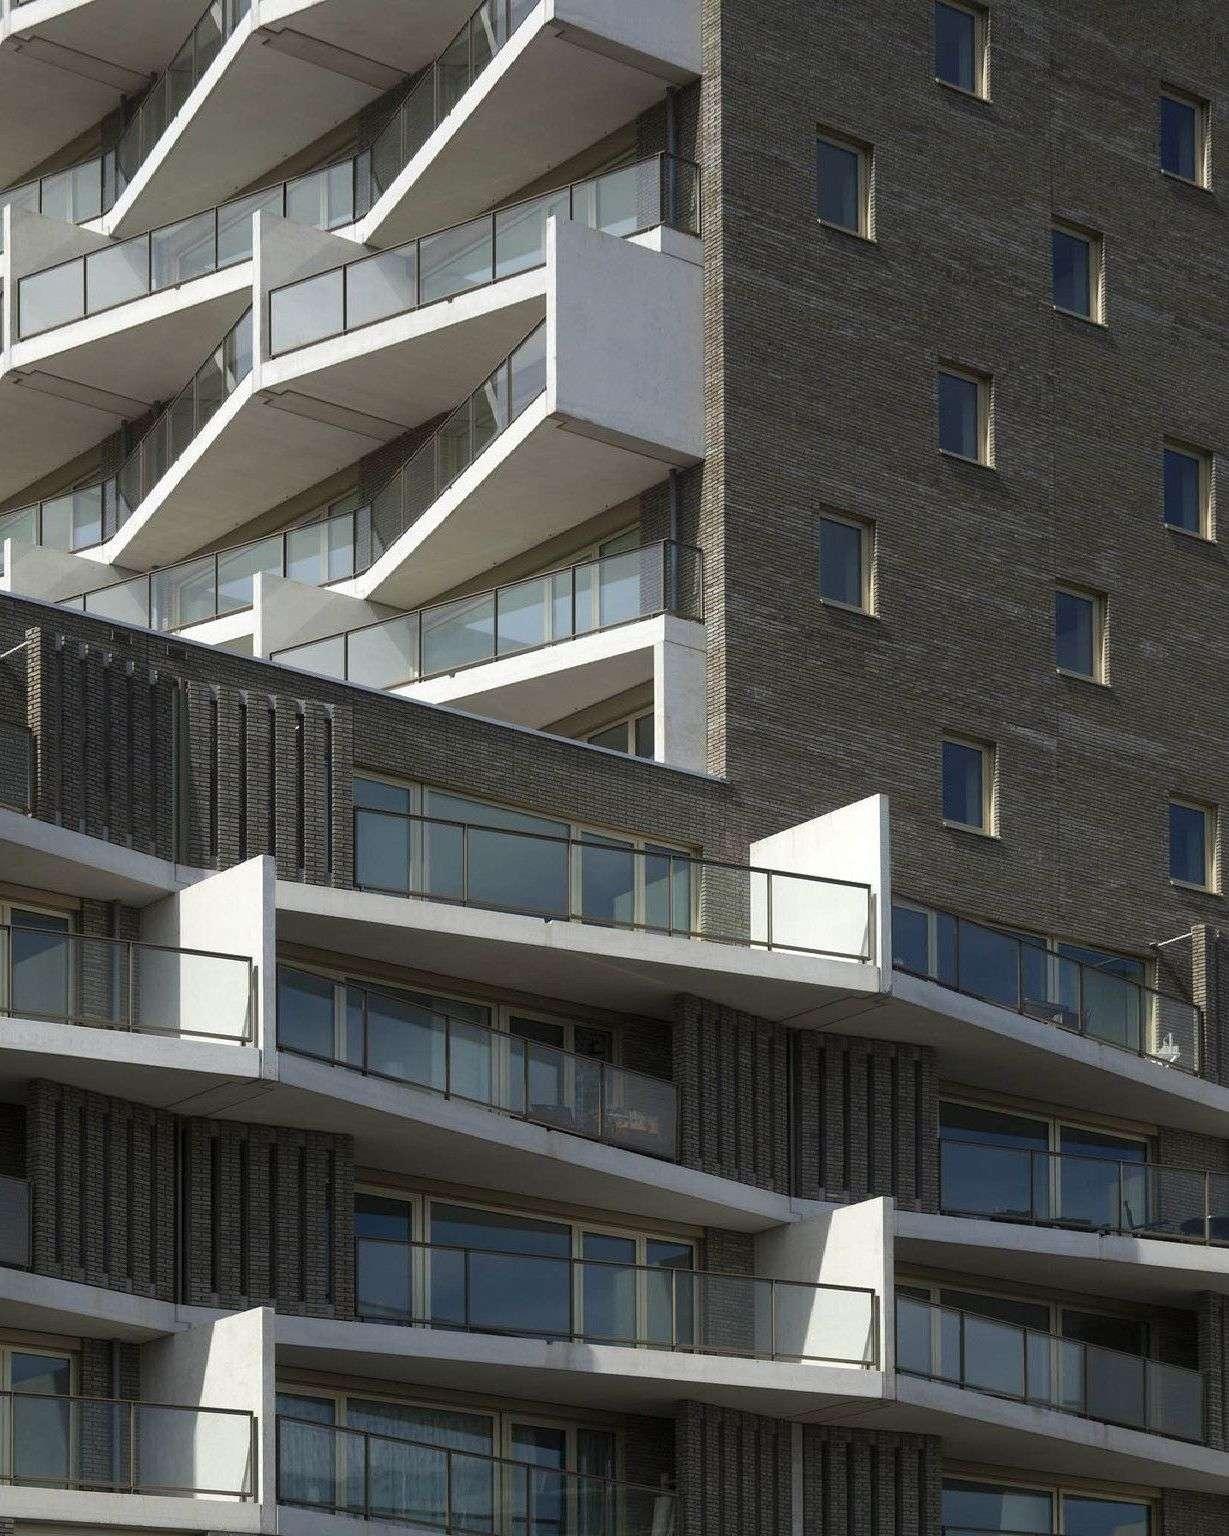 University Of Amsterdam Dorms: NL: Wohnanlage Kamaleon In Amsterdam